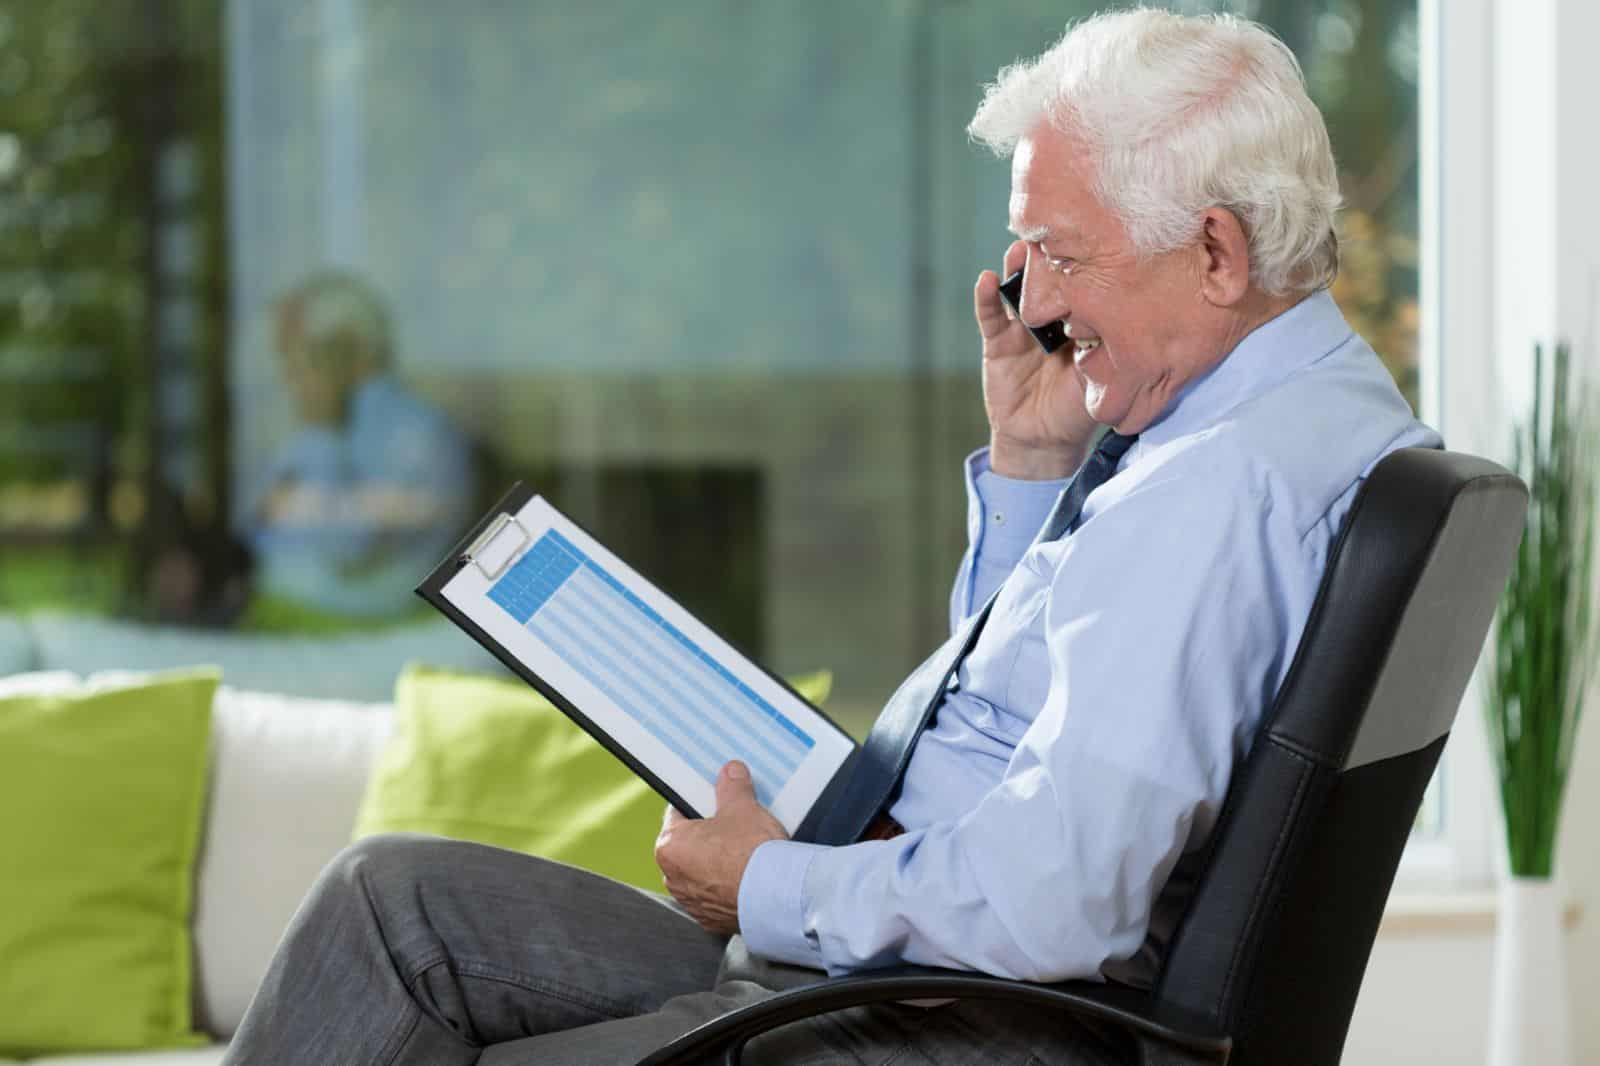 Правила приема документов на пенсию